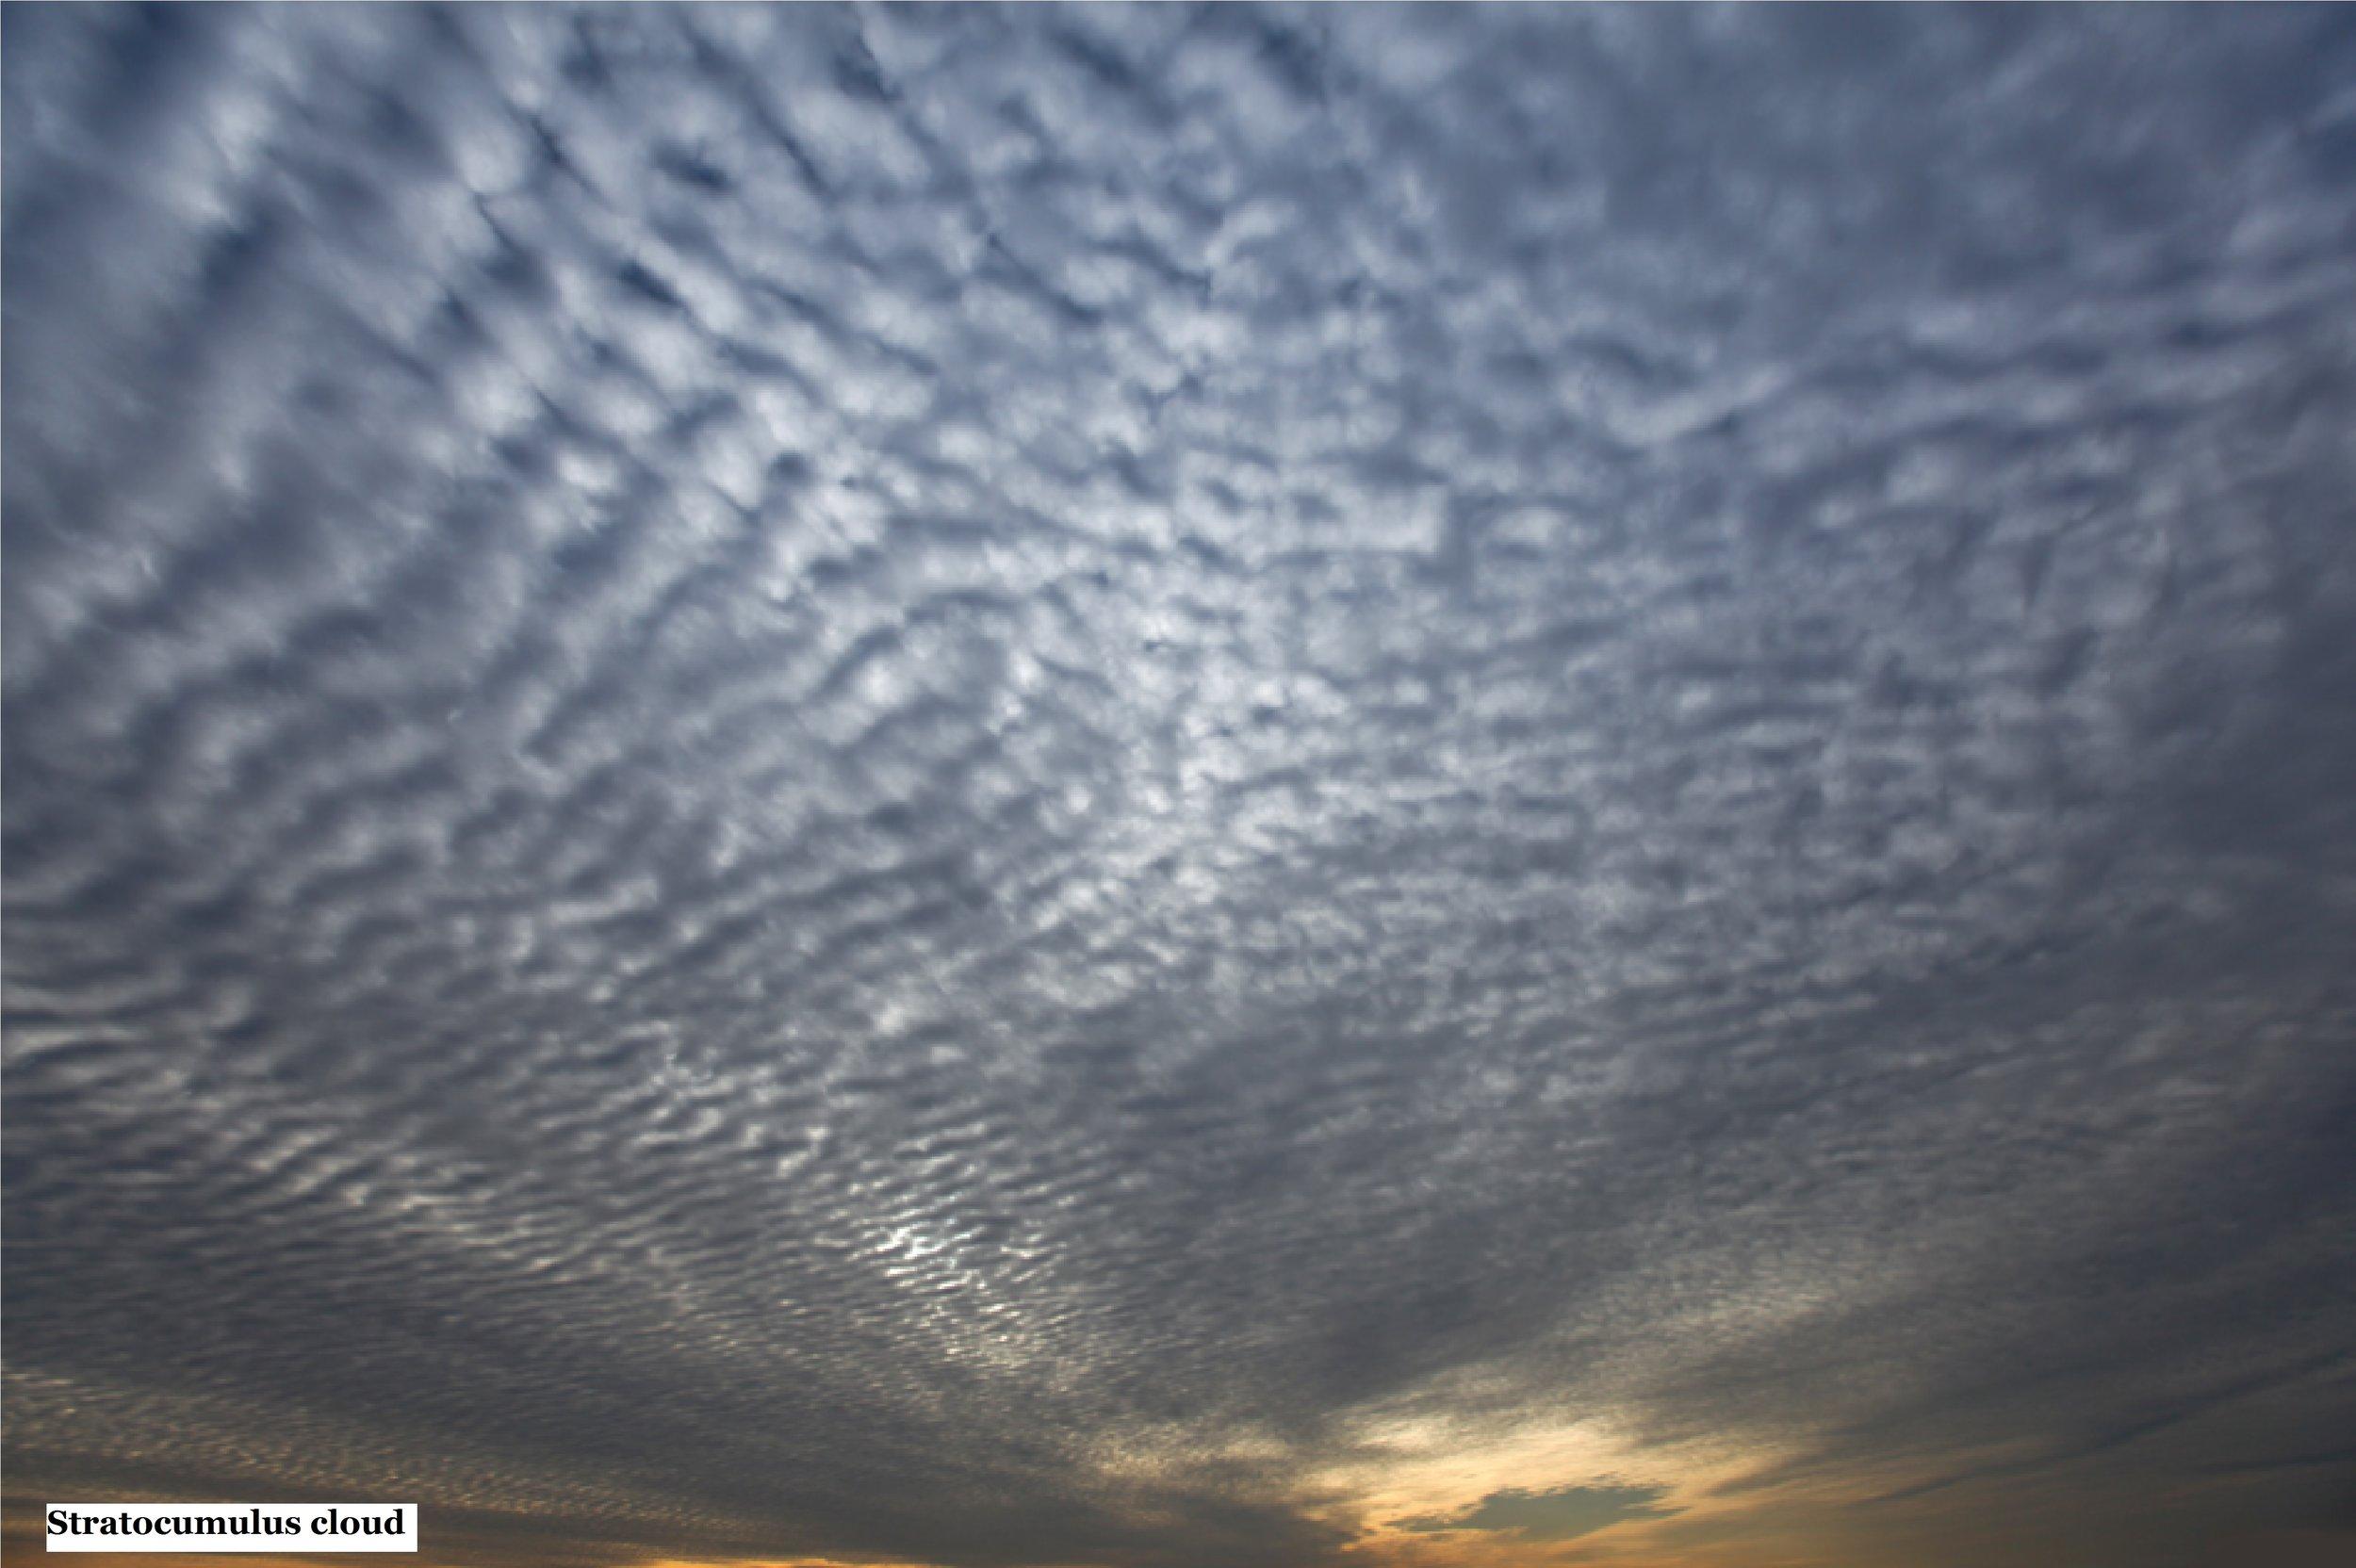 3 Stratocumulus cloud.jpg